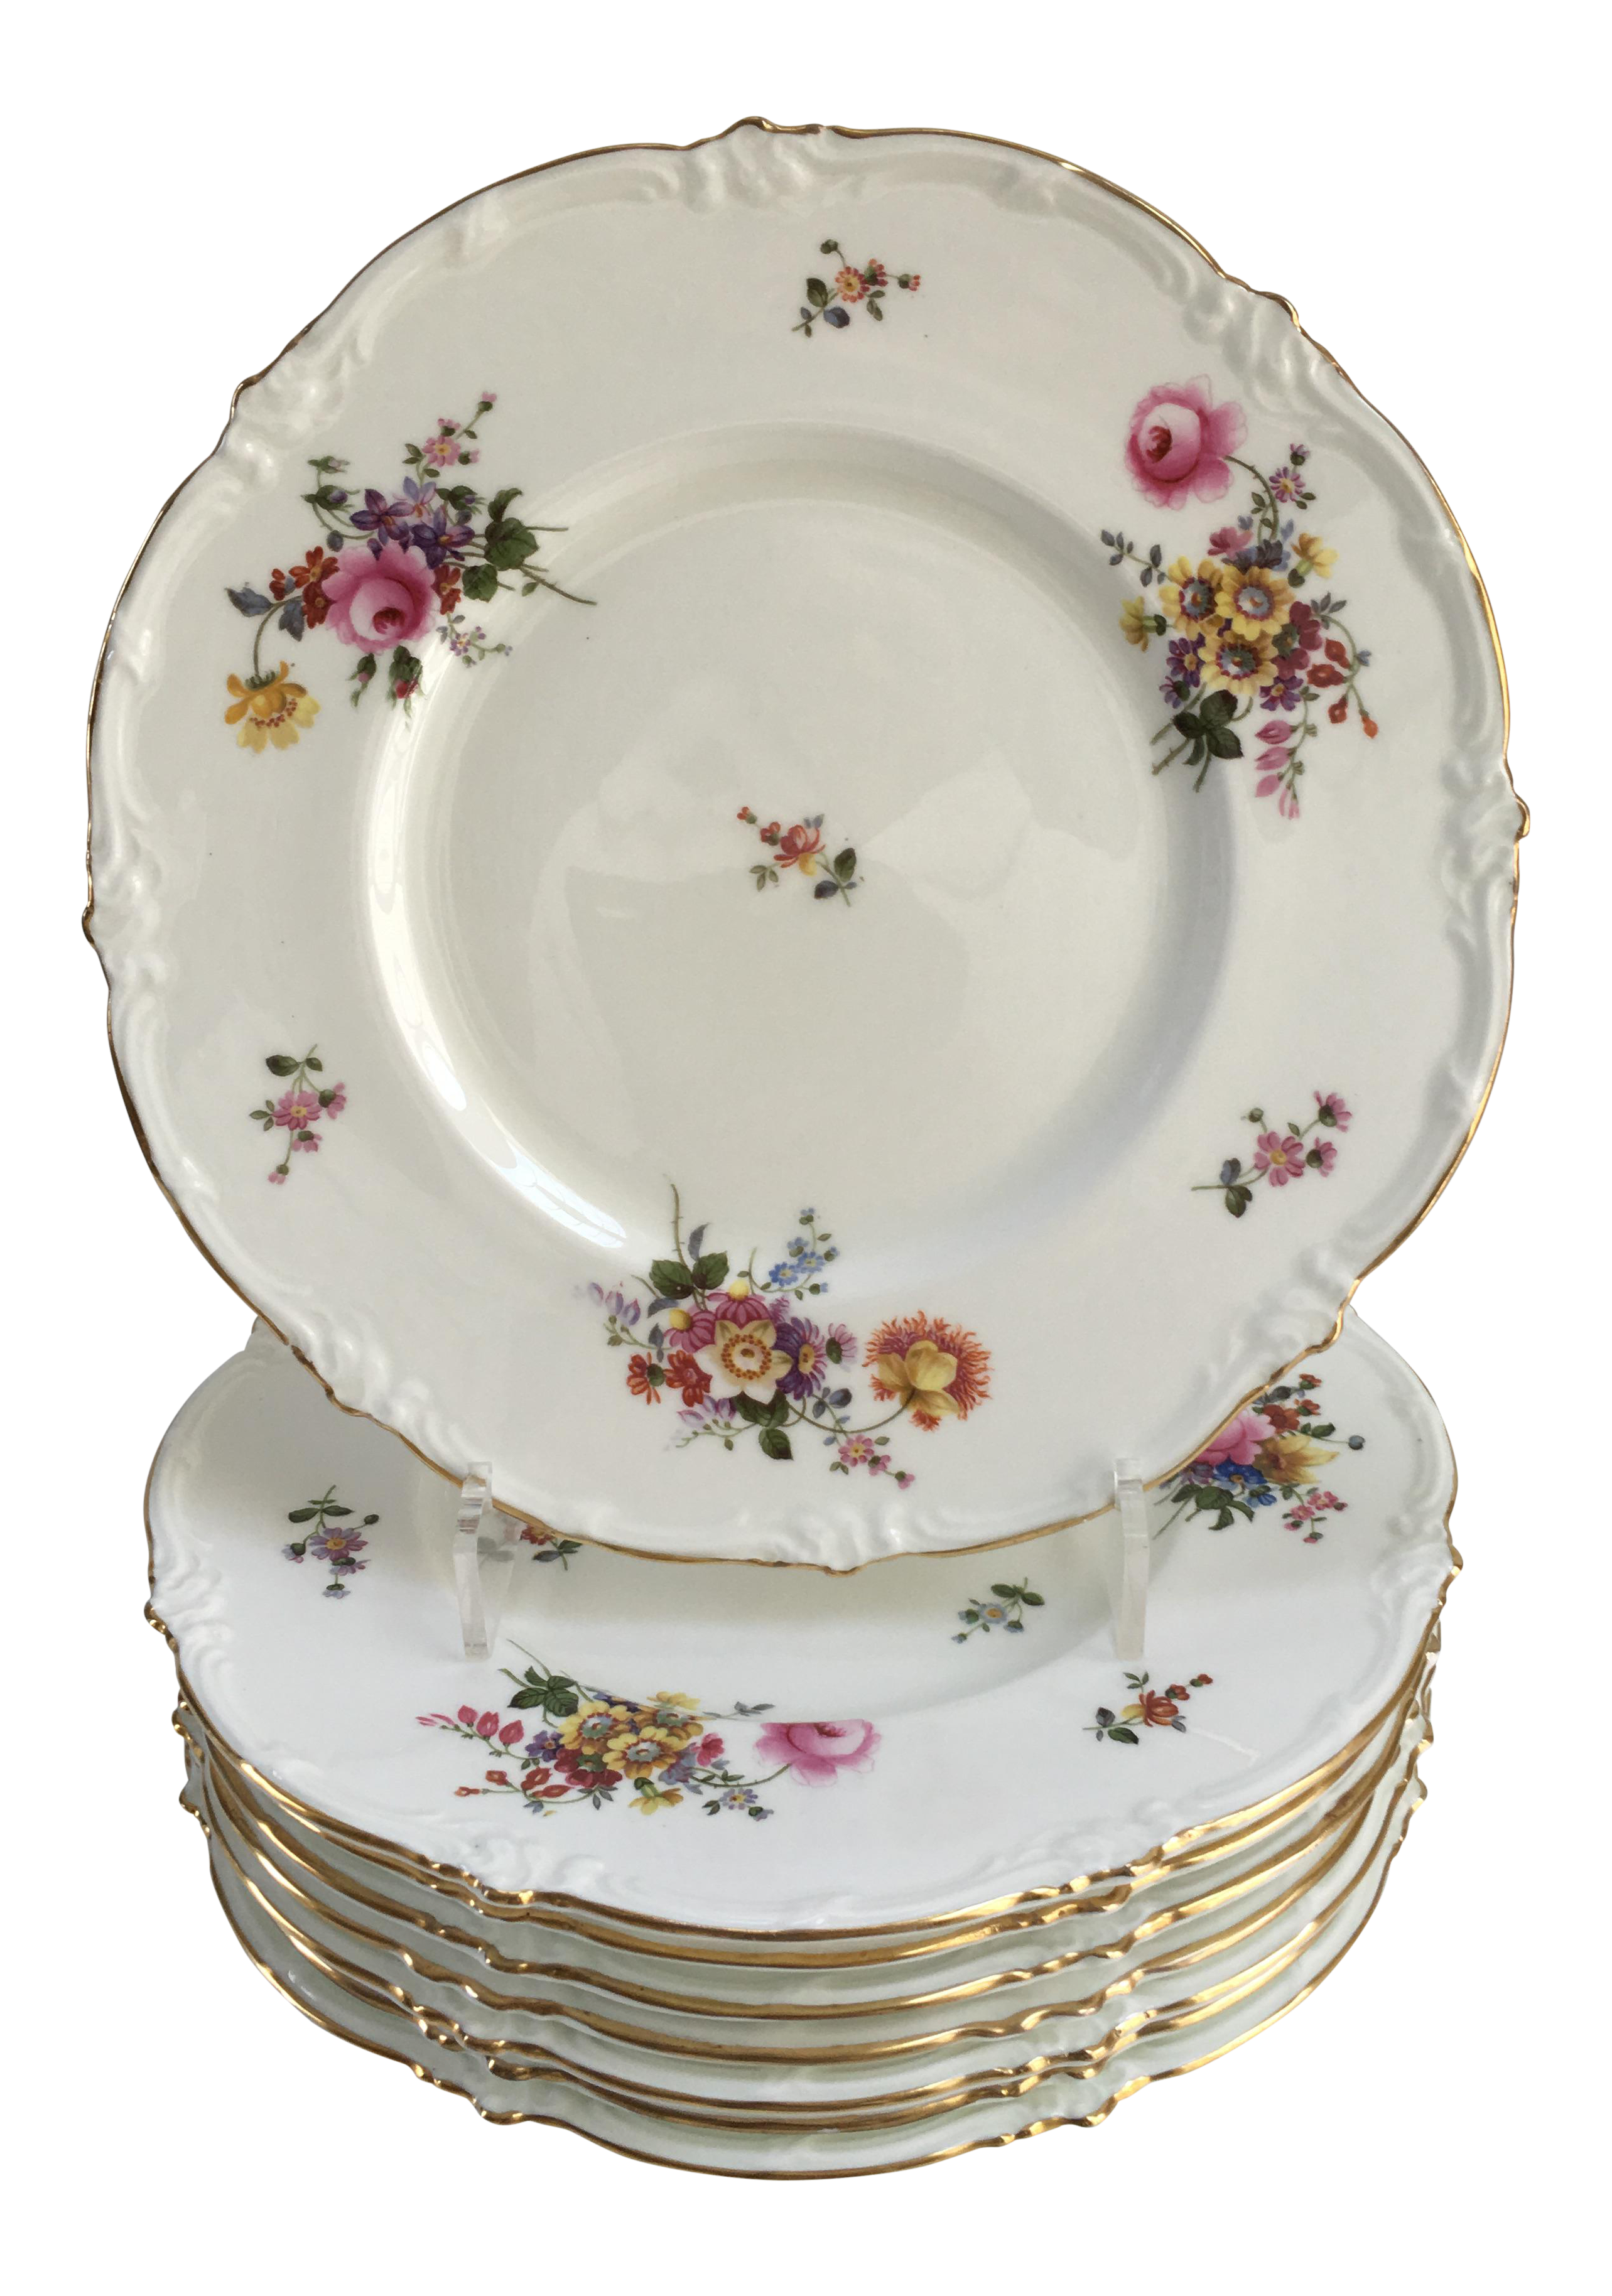 English Royal Cauldon Pink \u0026 Gold Floral Fine China Dinner Plates - Set ...  sc 1 st  Chairish & Vintage \u0026 Used English Traditional Dinnerware | Chairish